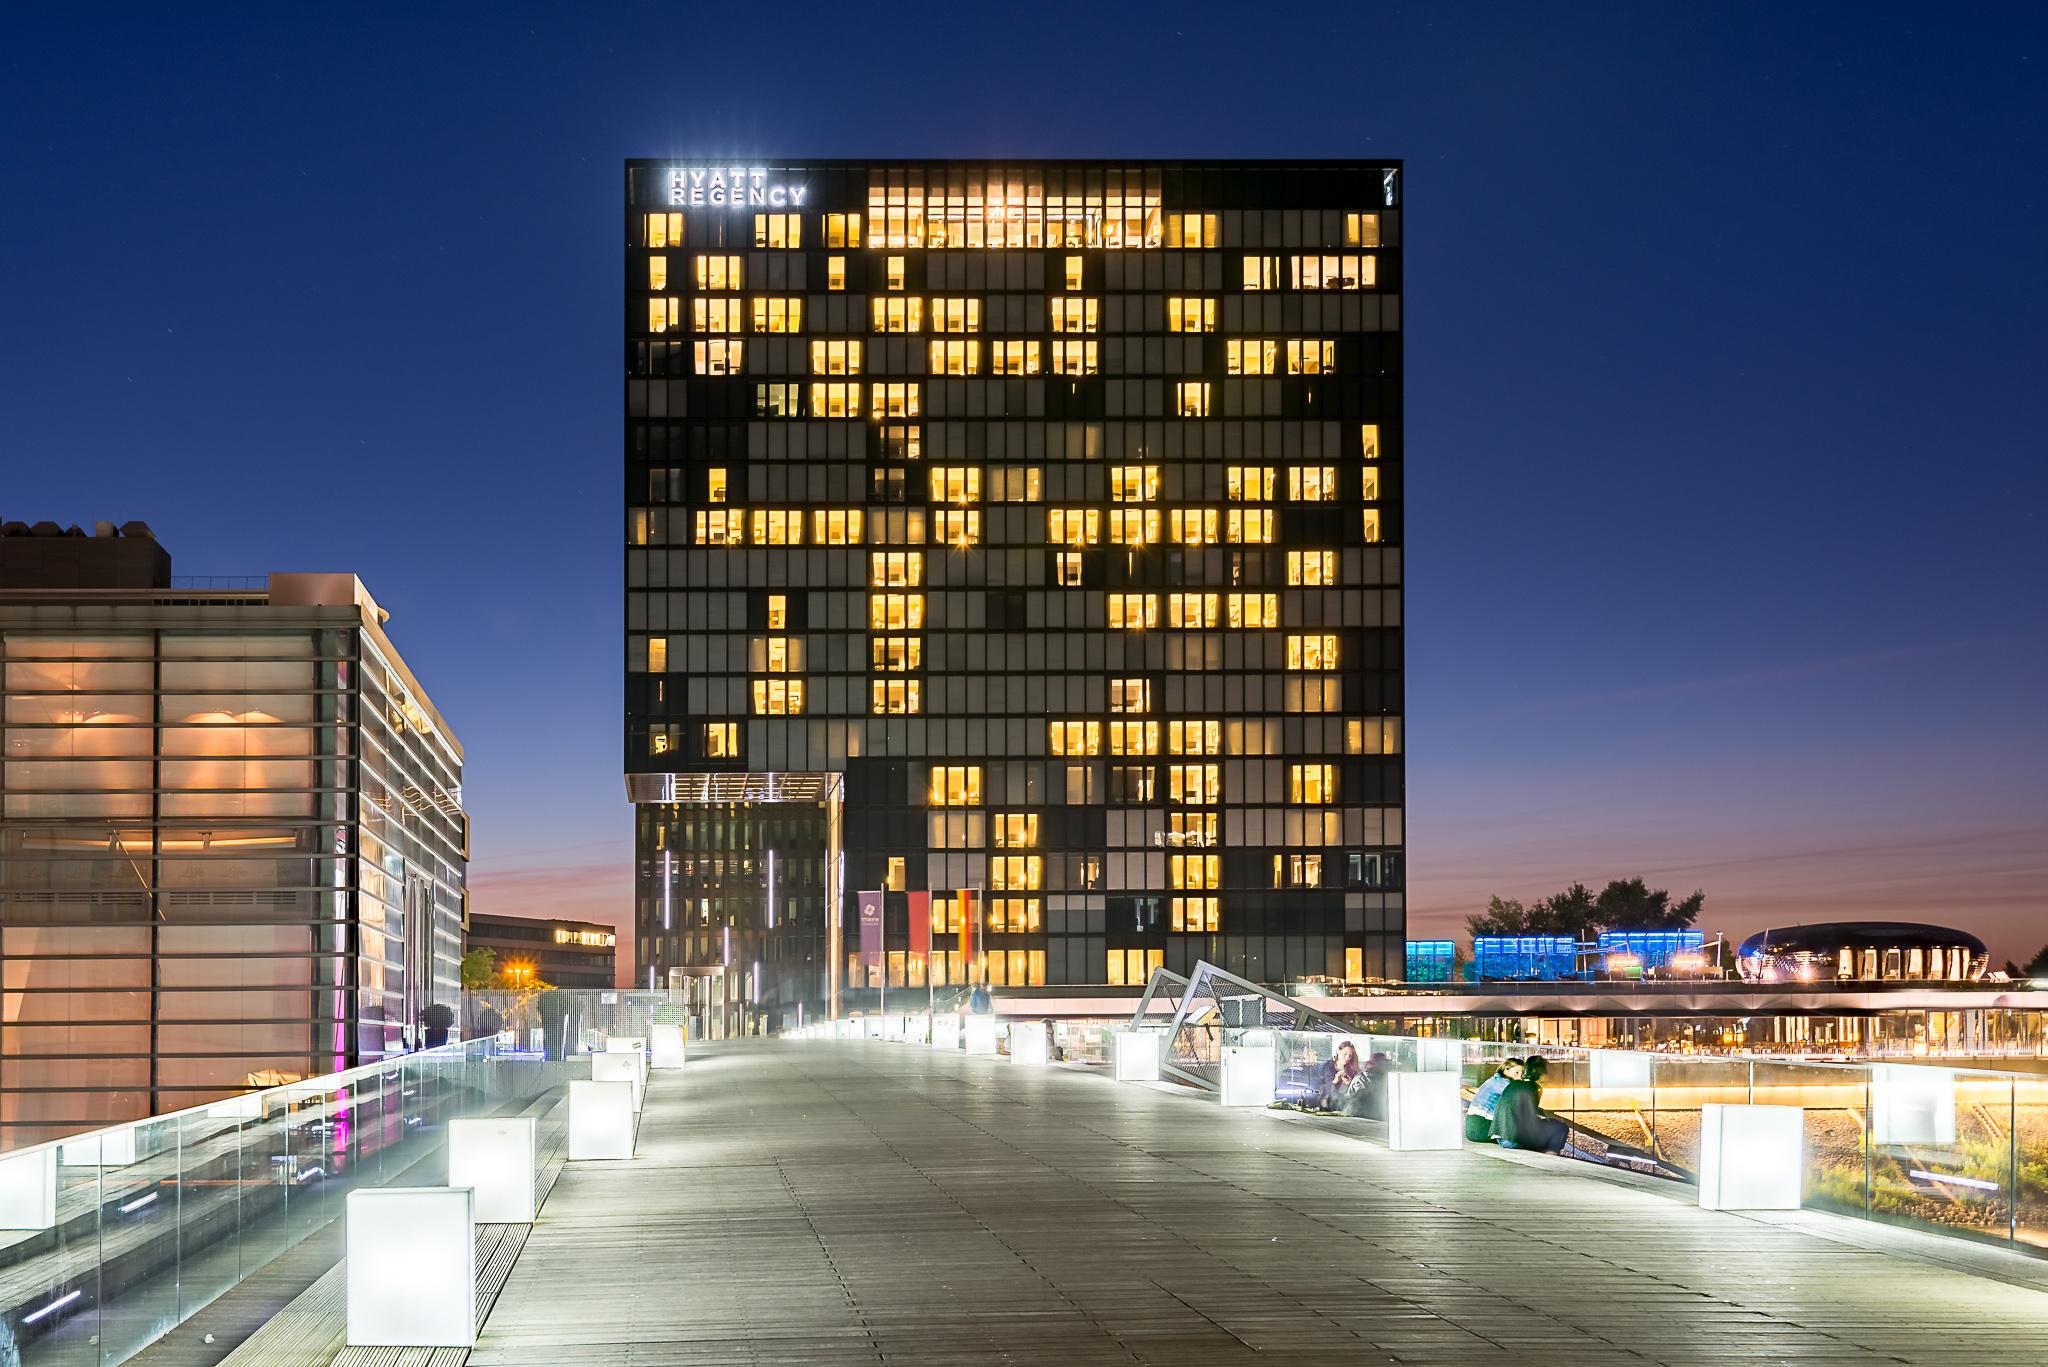 Hyatt Hotel in profile, Germany